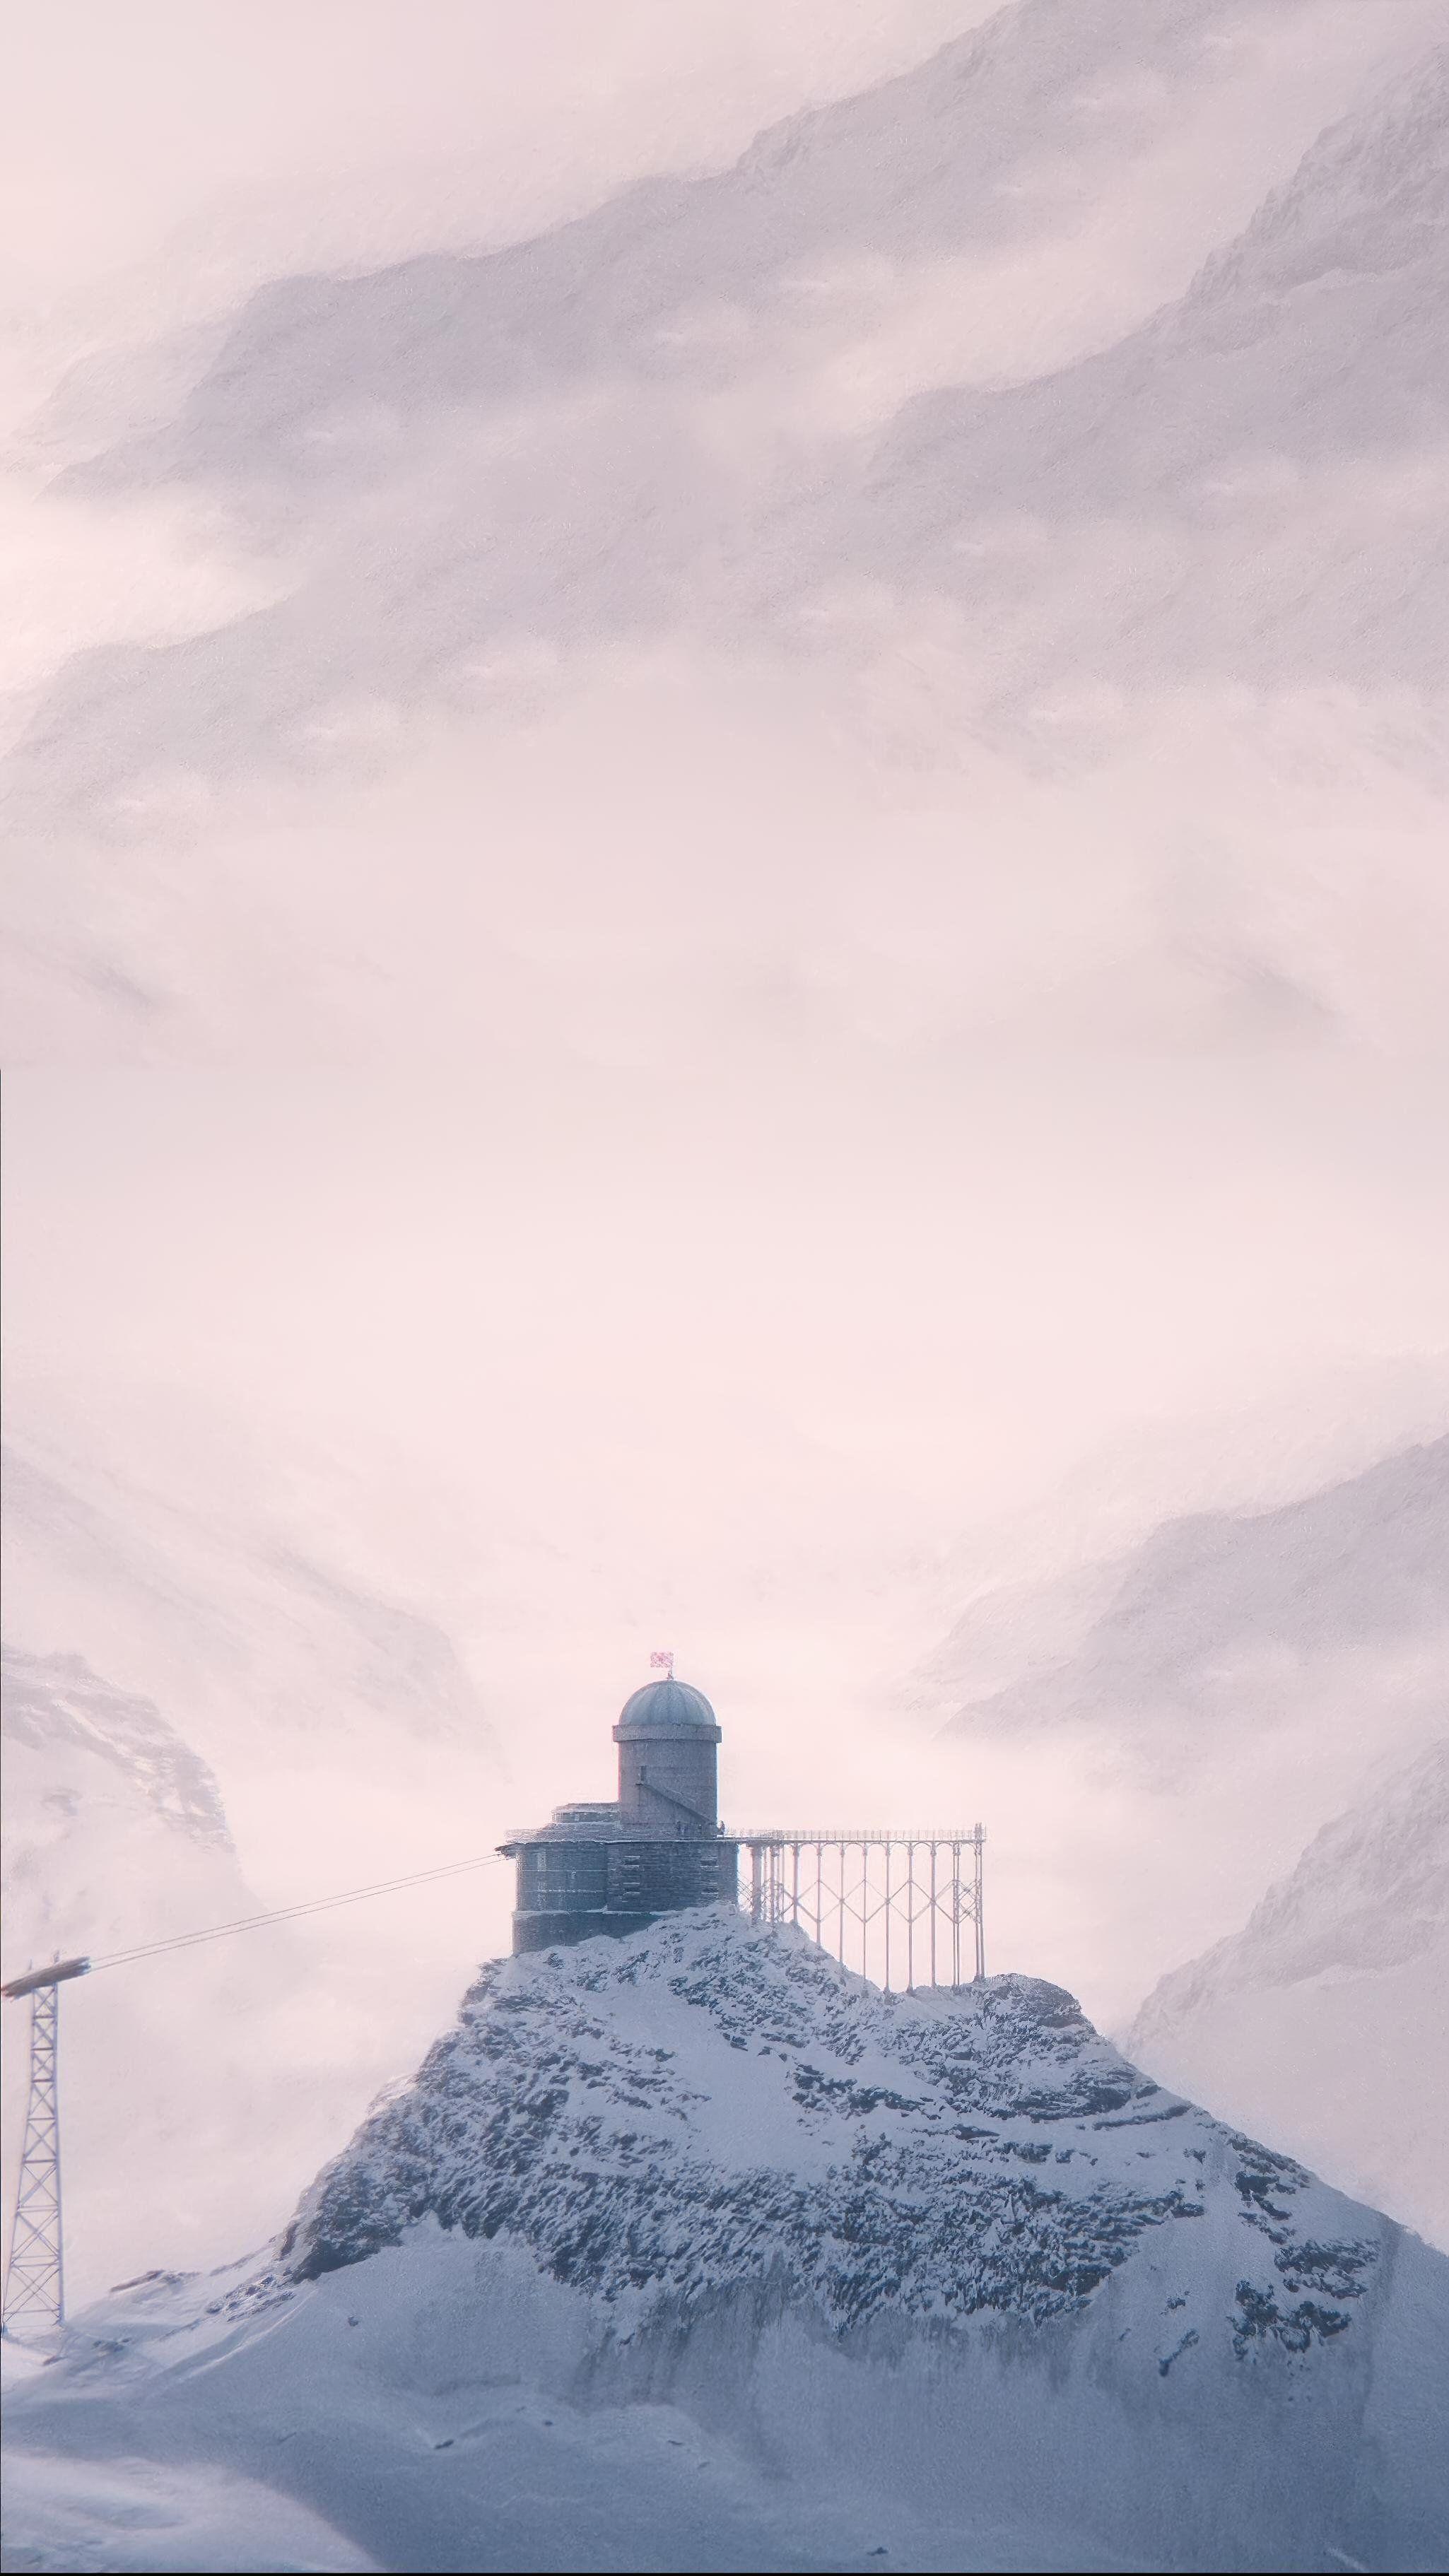 Akademie Zubrowka High Mountain Observatory [20503645 169 2050x3645